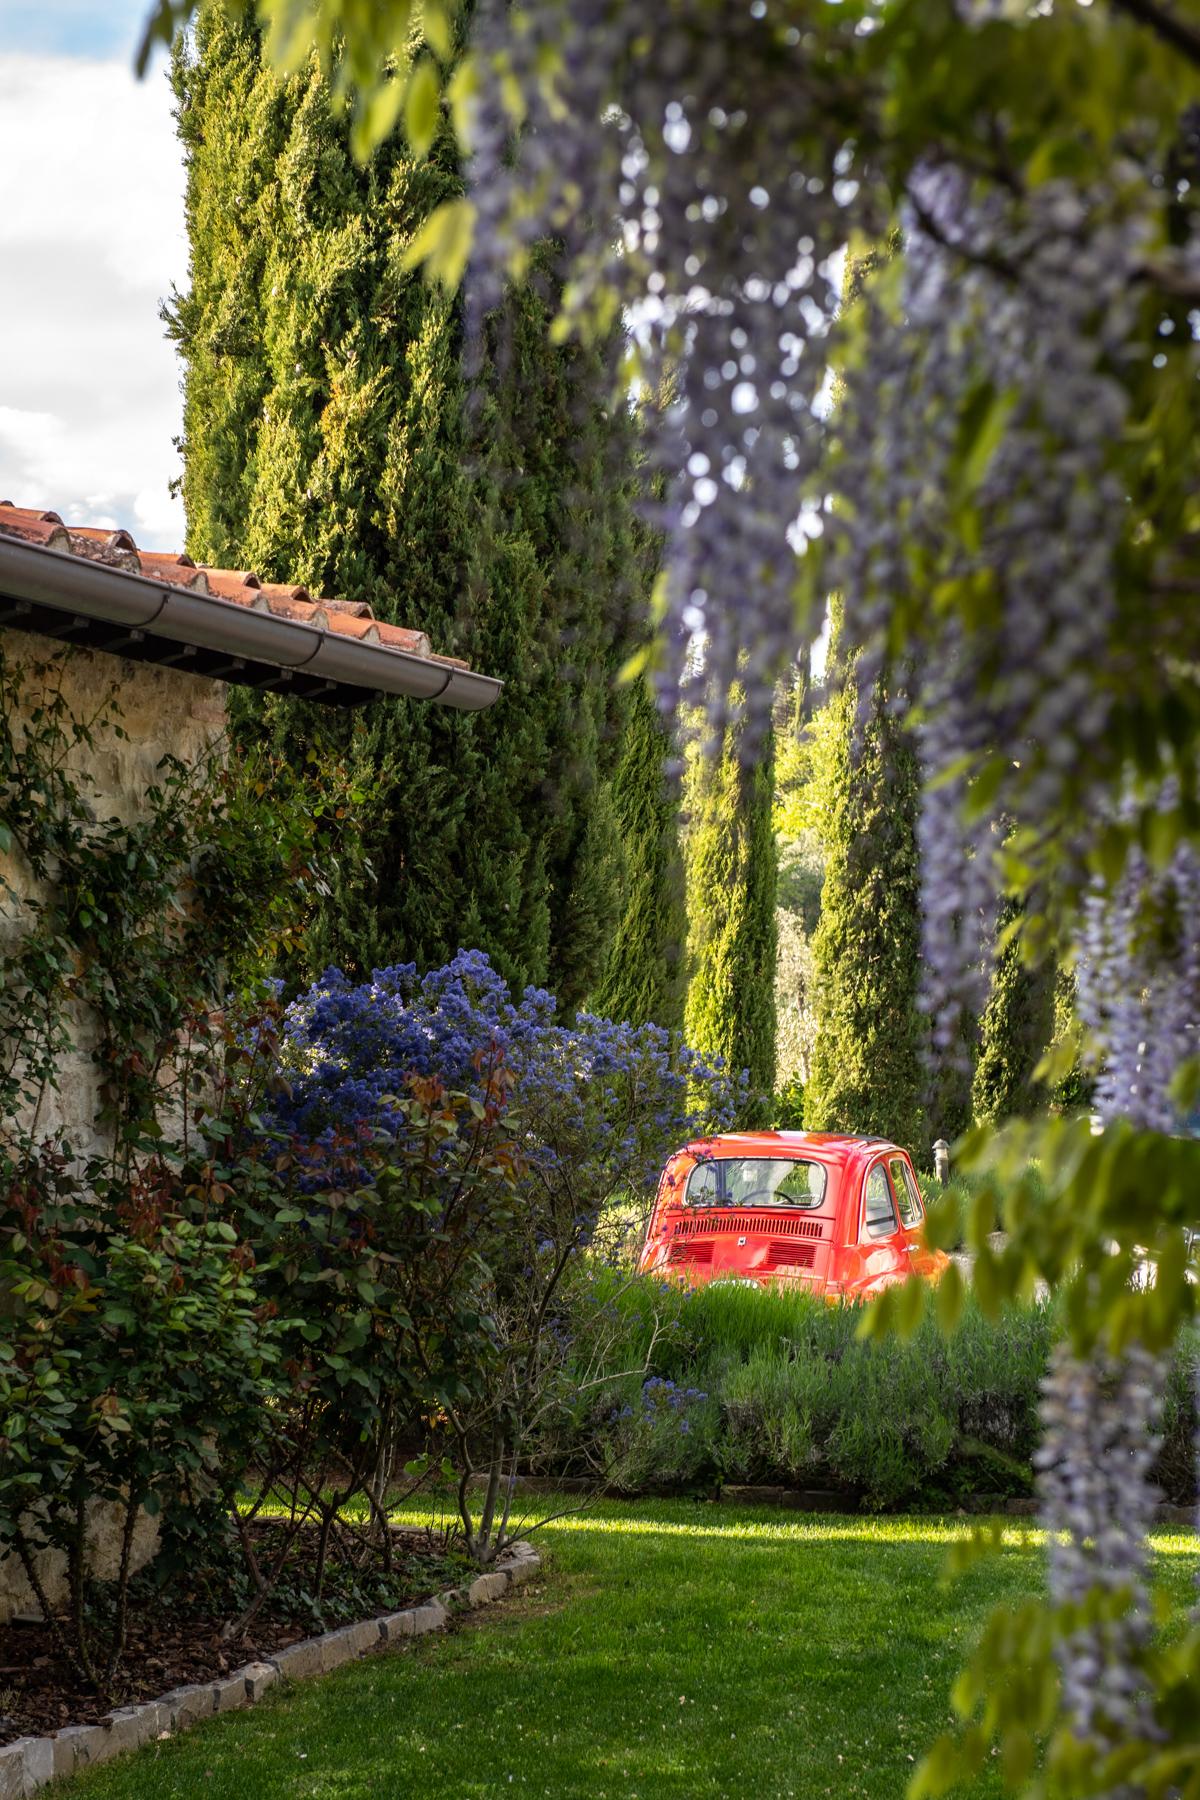 Stacie Flinner x Cuvee Tuscan Farmhouse Tuscany Italy Guide-19.jpg